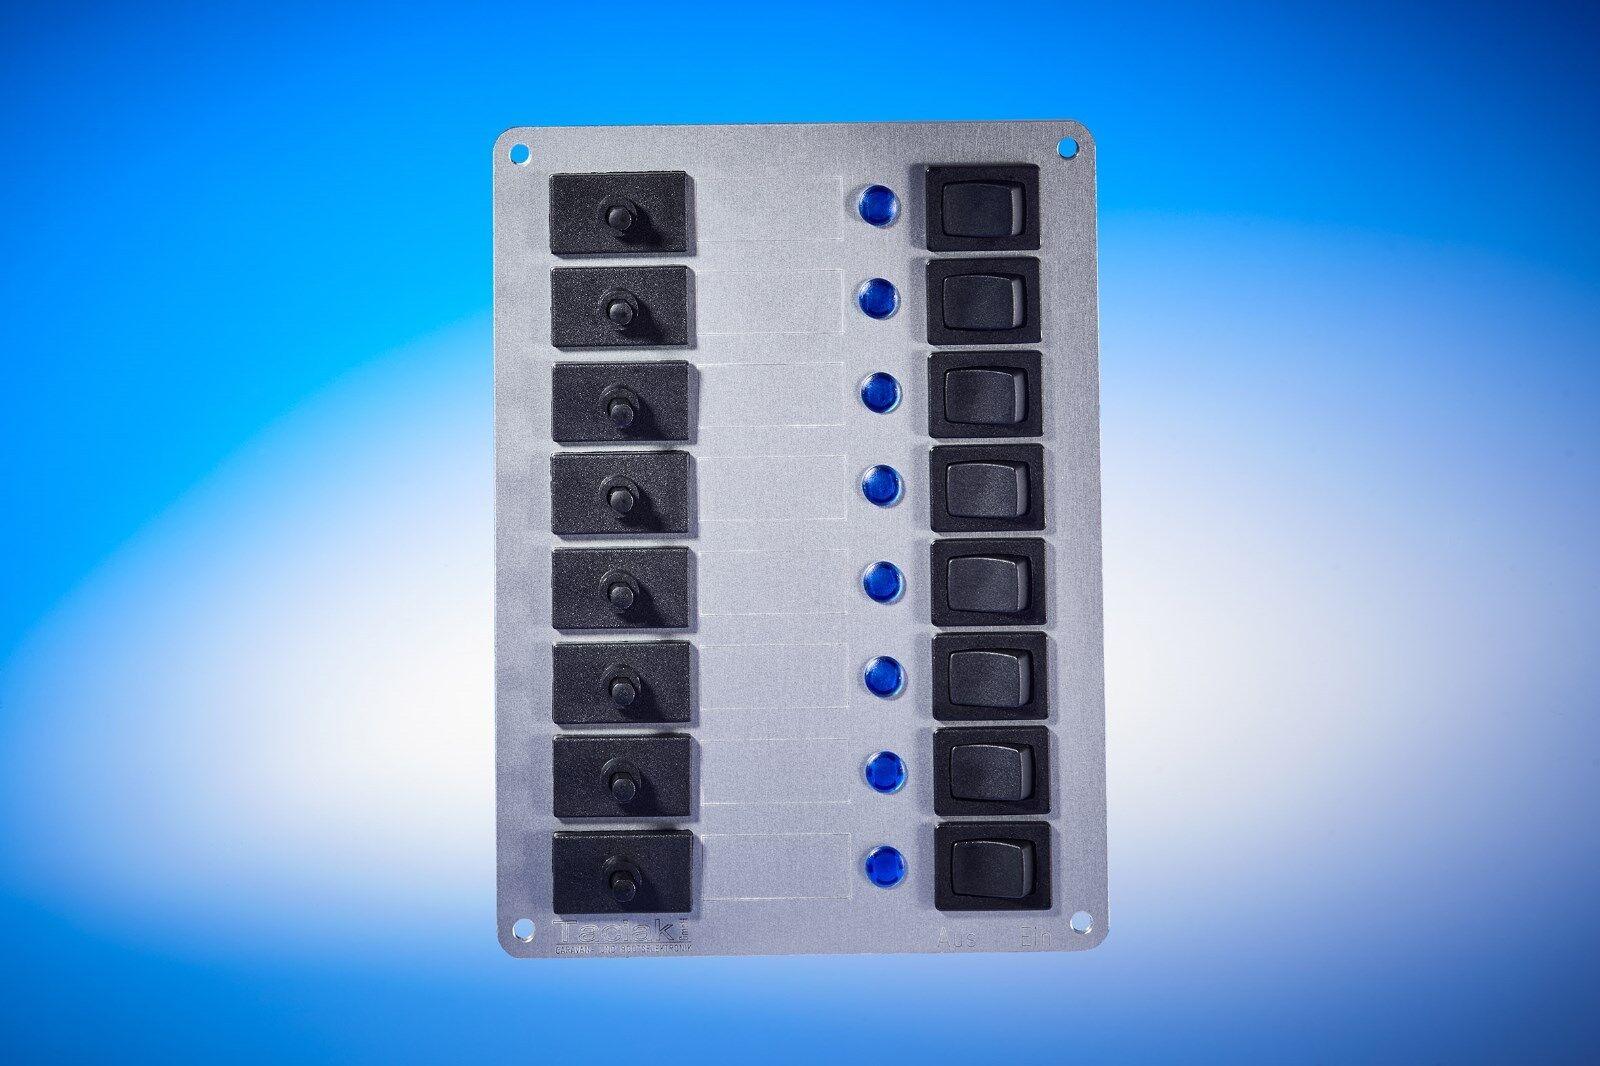 Stromkreisverteiler 110, Serie 110, Stromkreisverteiler Typ: SV 08 4a68f8